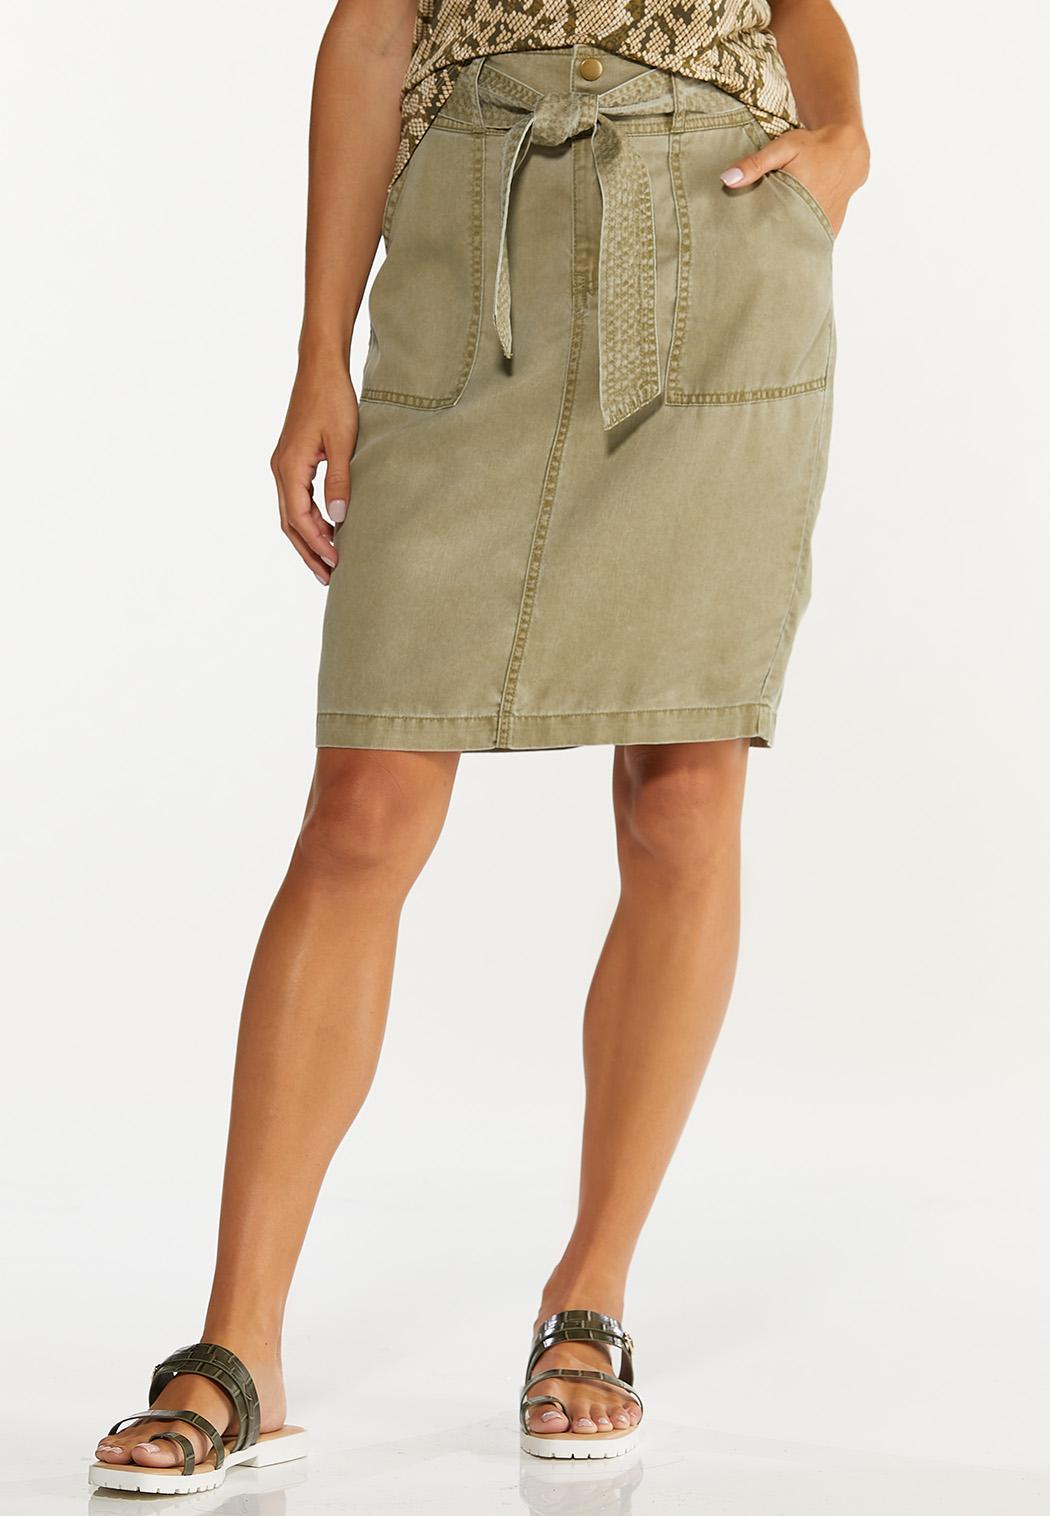 Olive Pencil Skirt